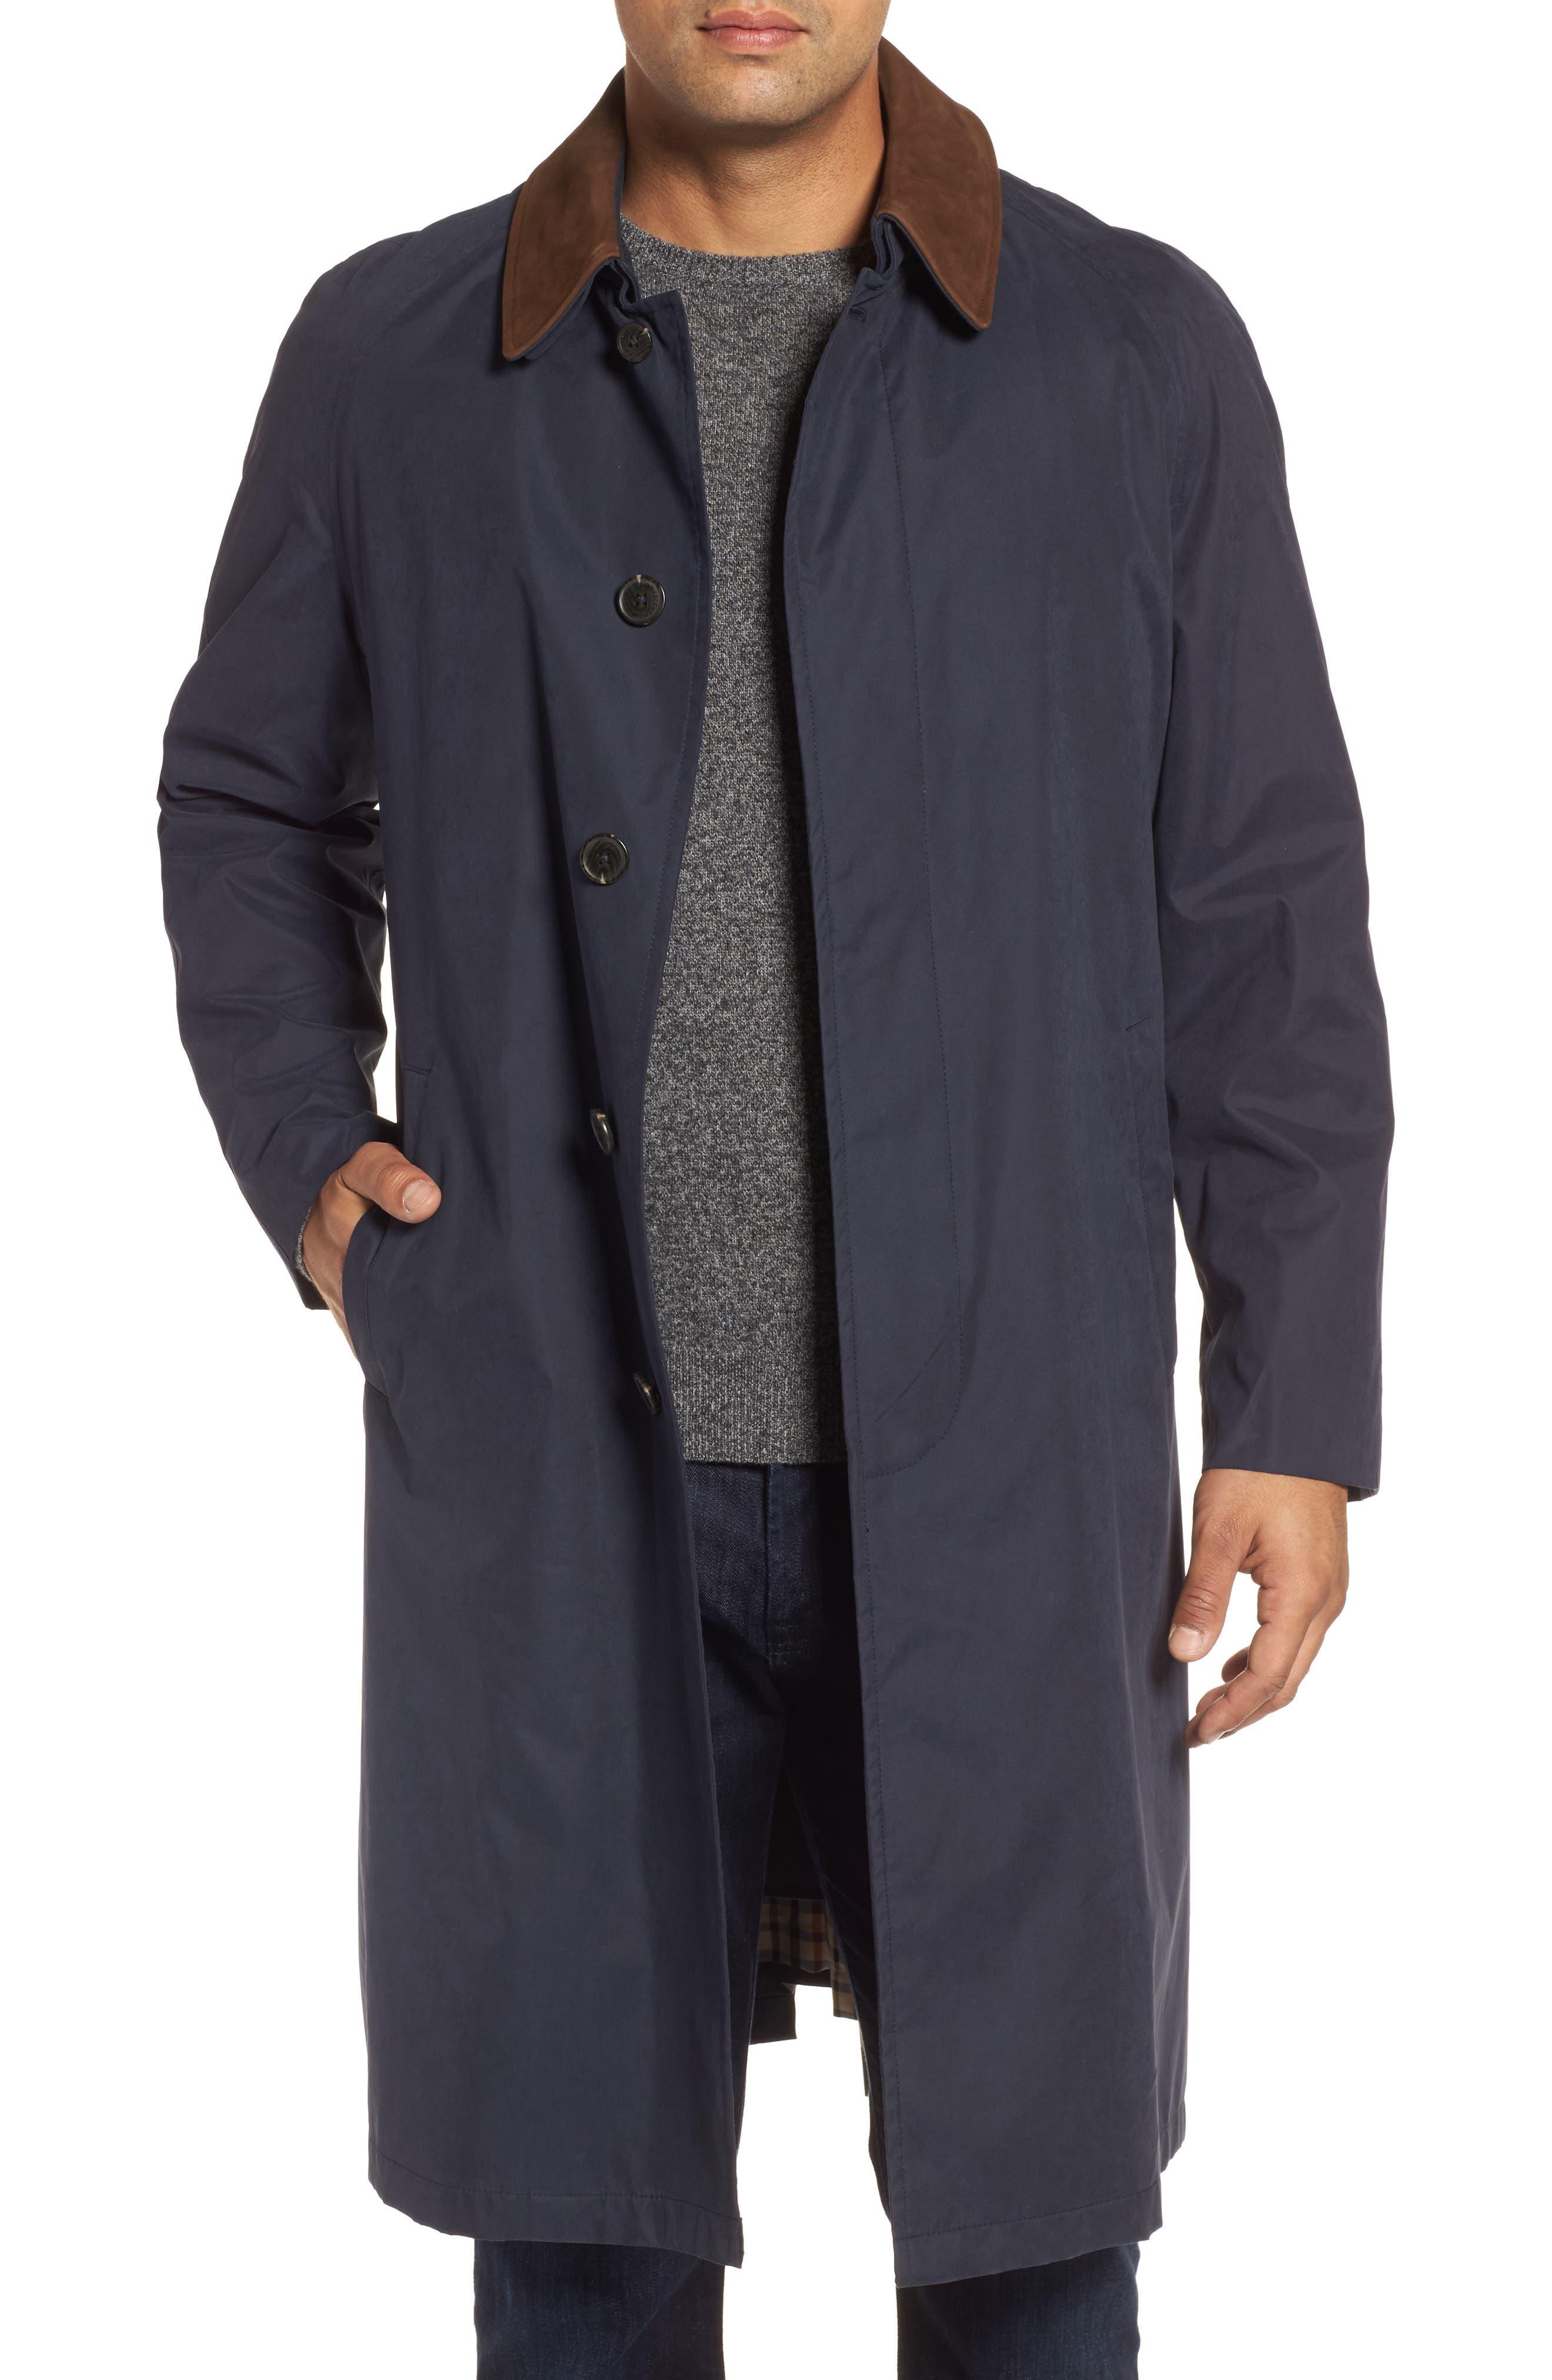 Lawrence Classic Fit Rain Coat,                         Main,                         color, 410